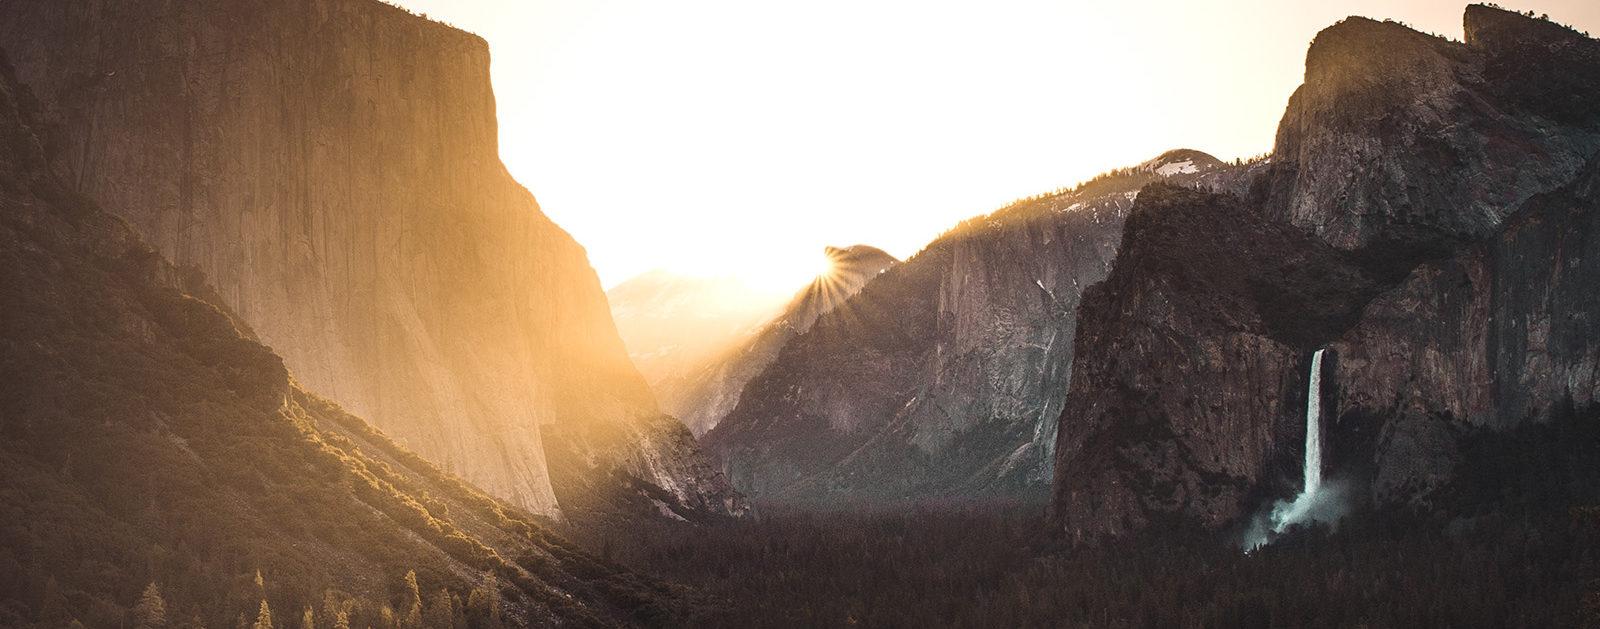 Yosemite Valley, CA   Casey Horner